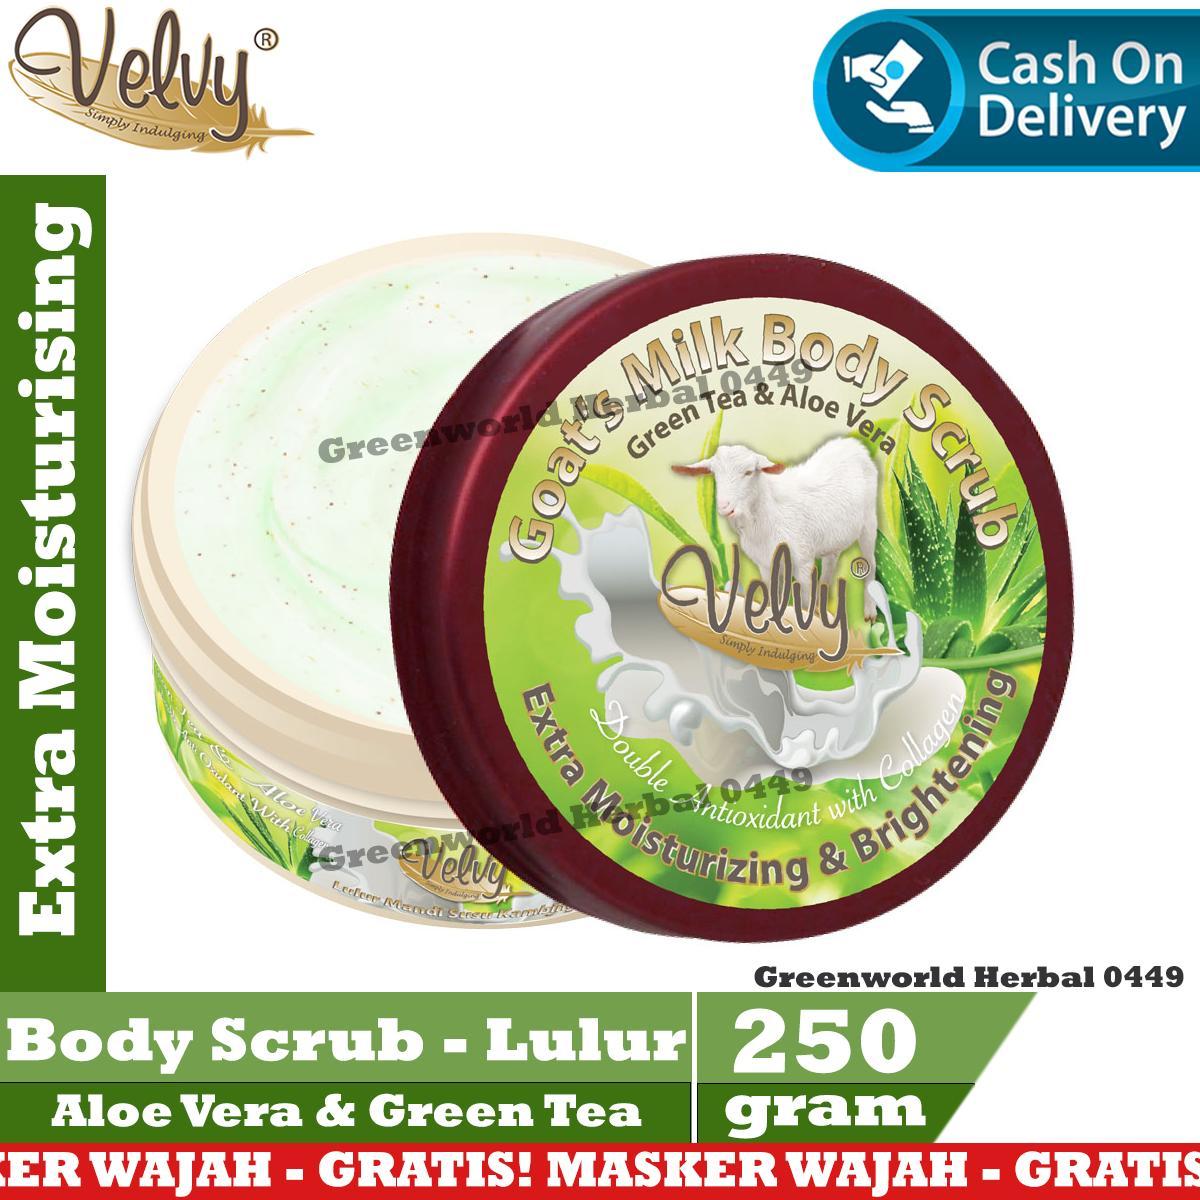 Lulur Bali Spa Green Tea Idea Gallery Cream 100gr Velvy Body Scrub Aloe Vera Original 250 Gram